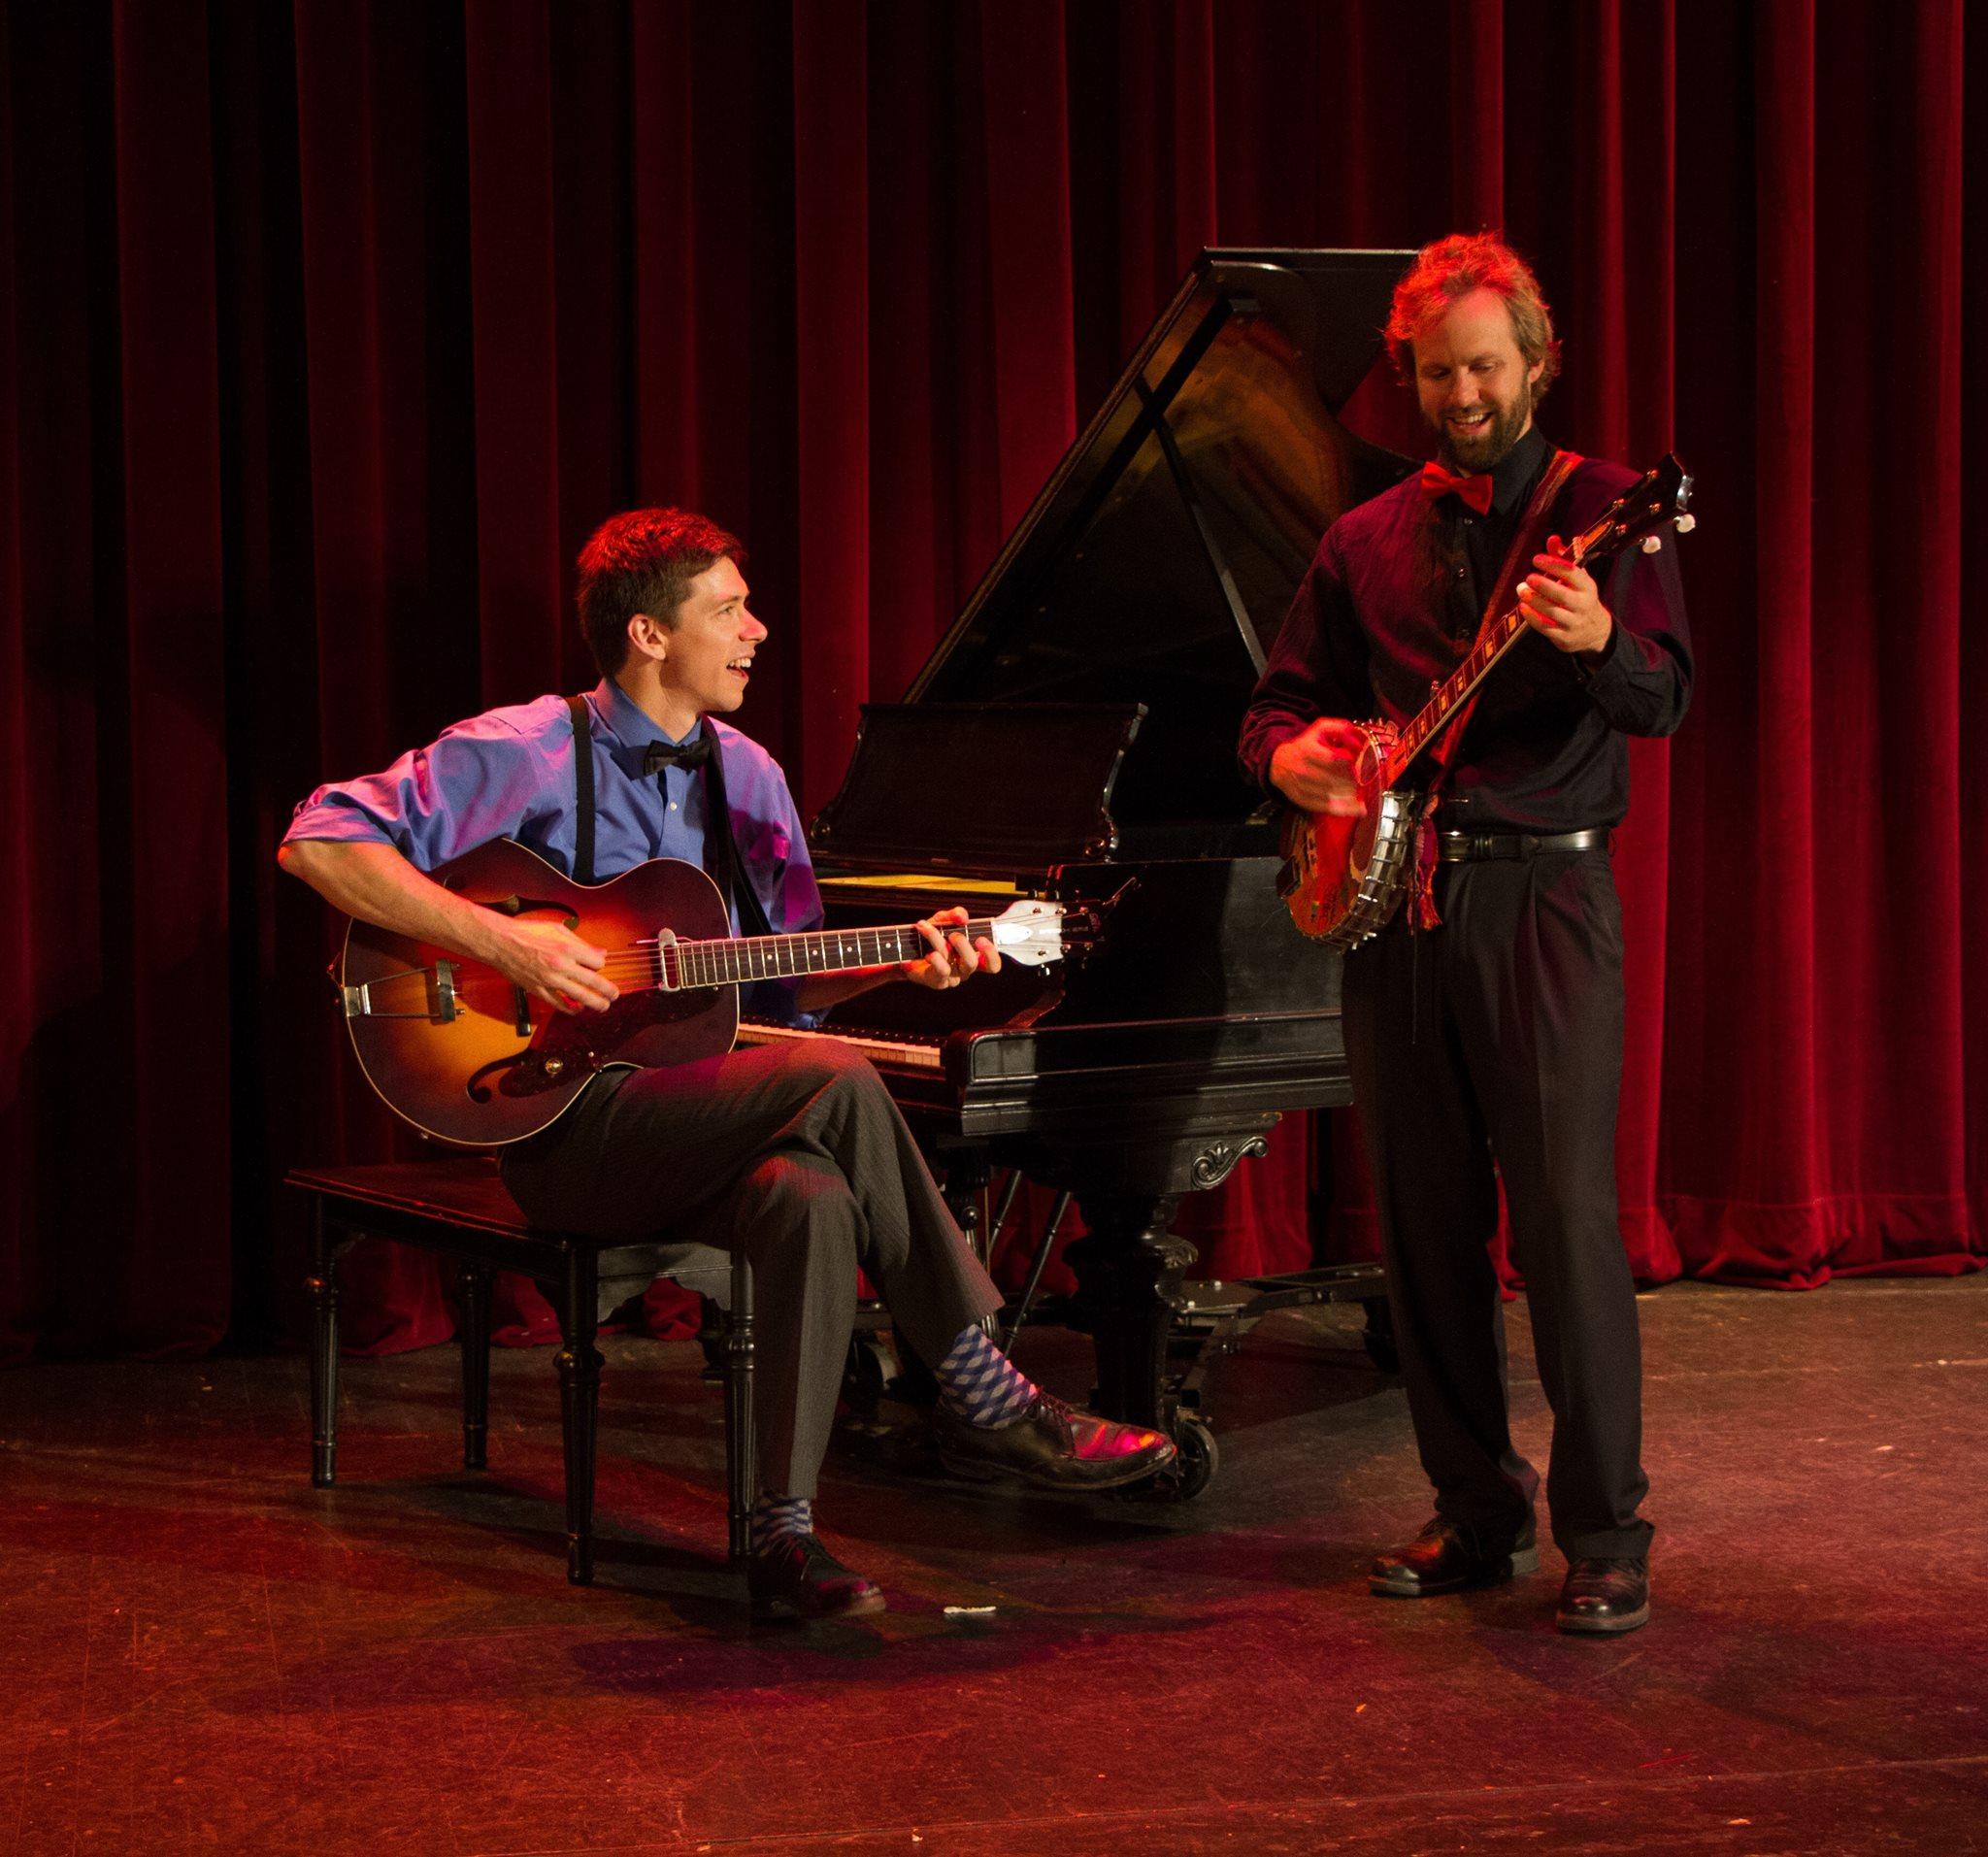 nate and travis piano guitar banjo state.jpg